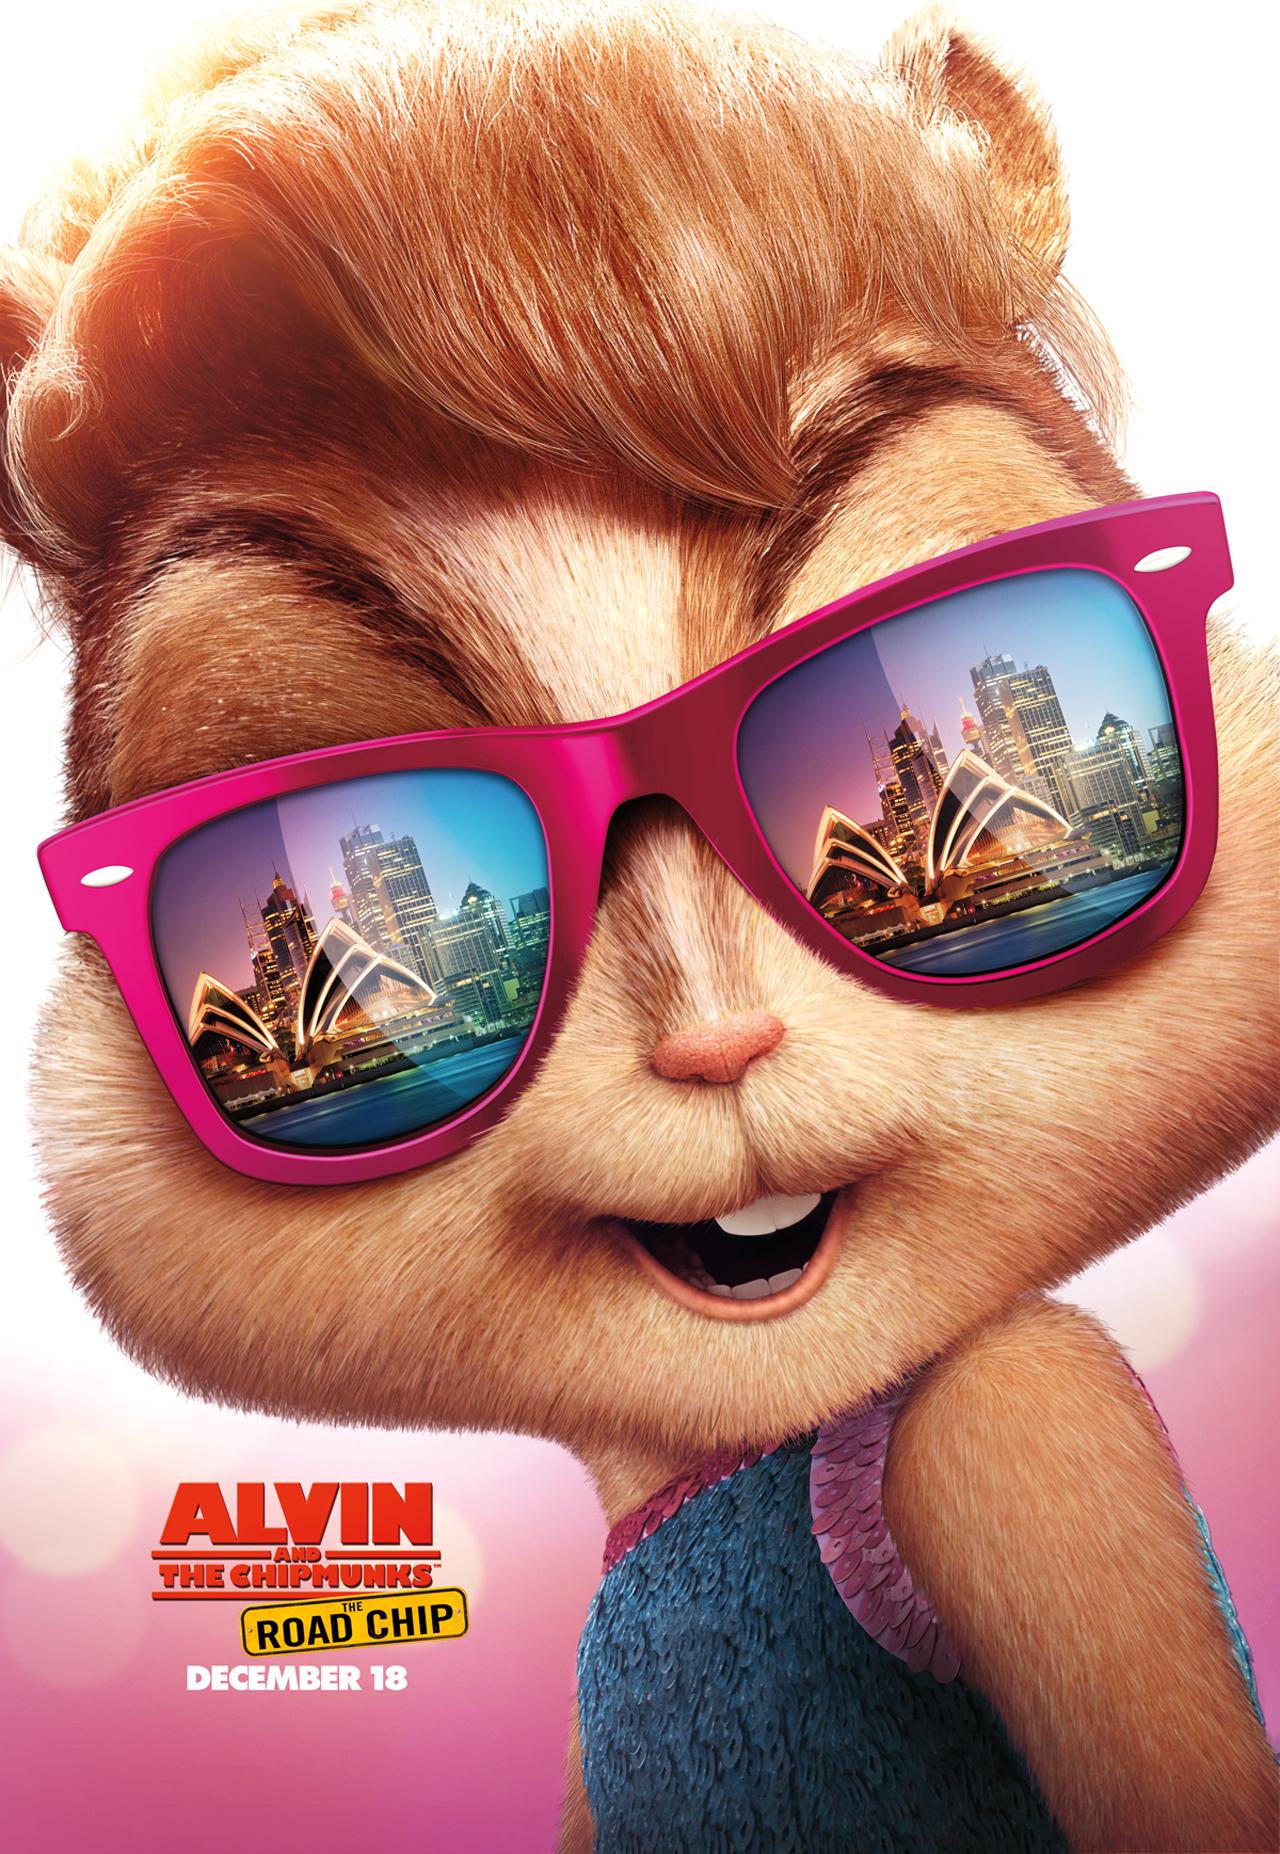 Alvin And The Chipmunks The Road Chip Comingsoon Net Fotos De Perfil Whatsapp Ardillas Fondos De Dibujos Animados